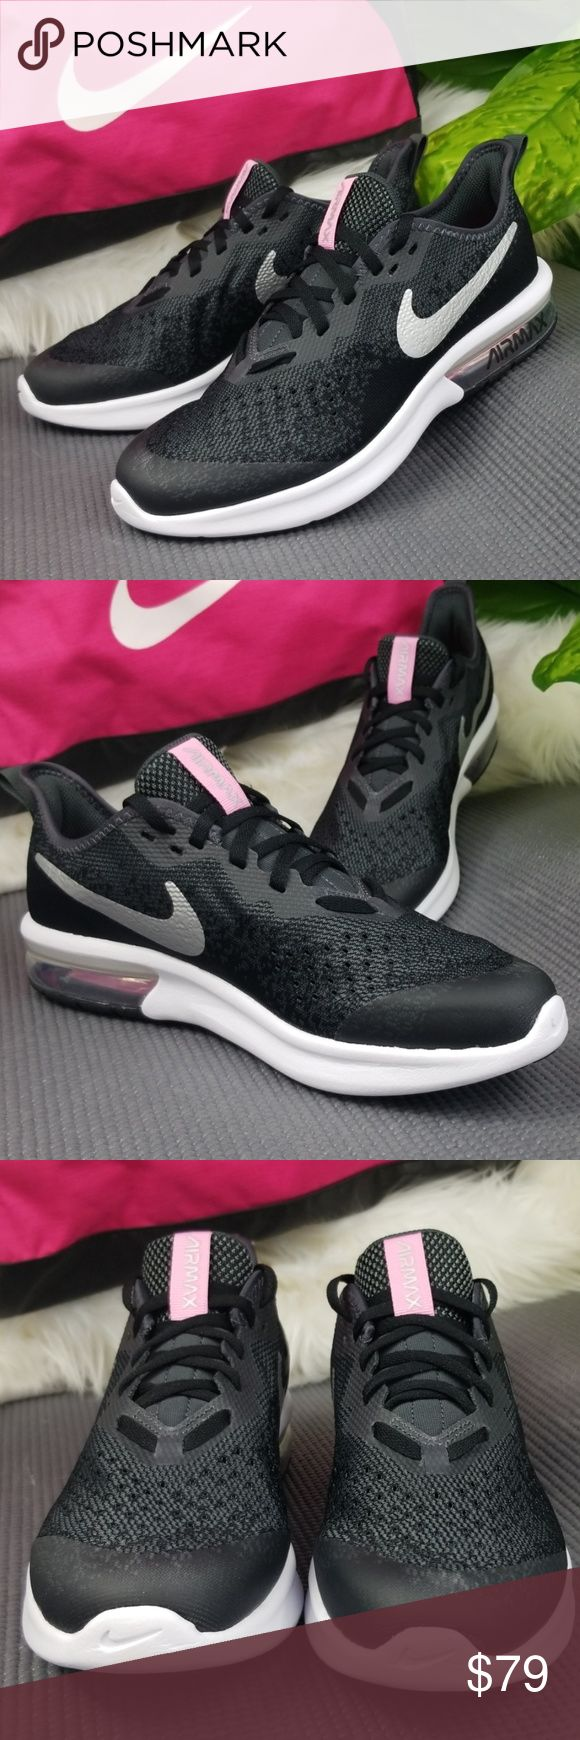 Nike Air Max Sequent 4 Youth/Womens NWT Black nikes